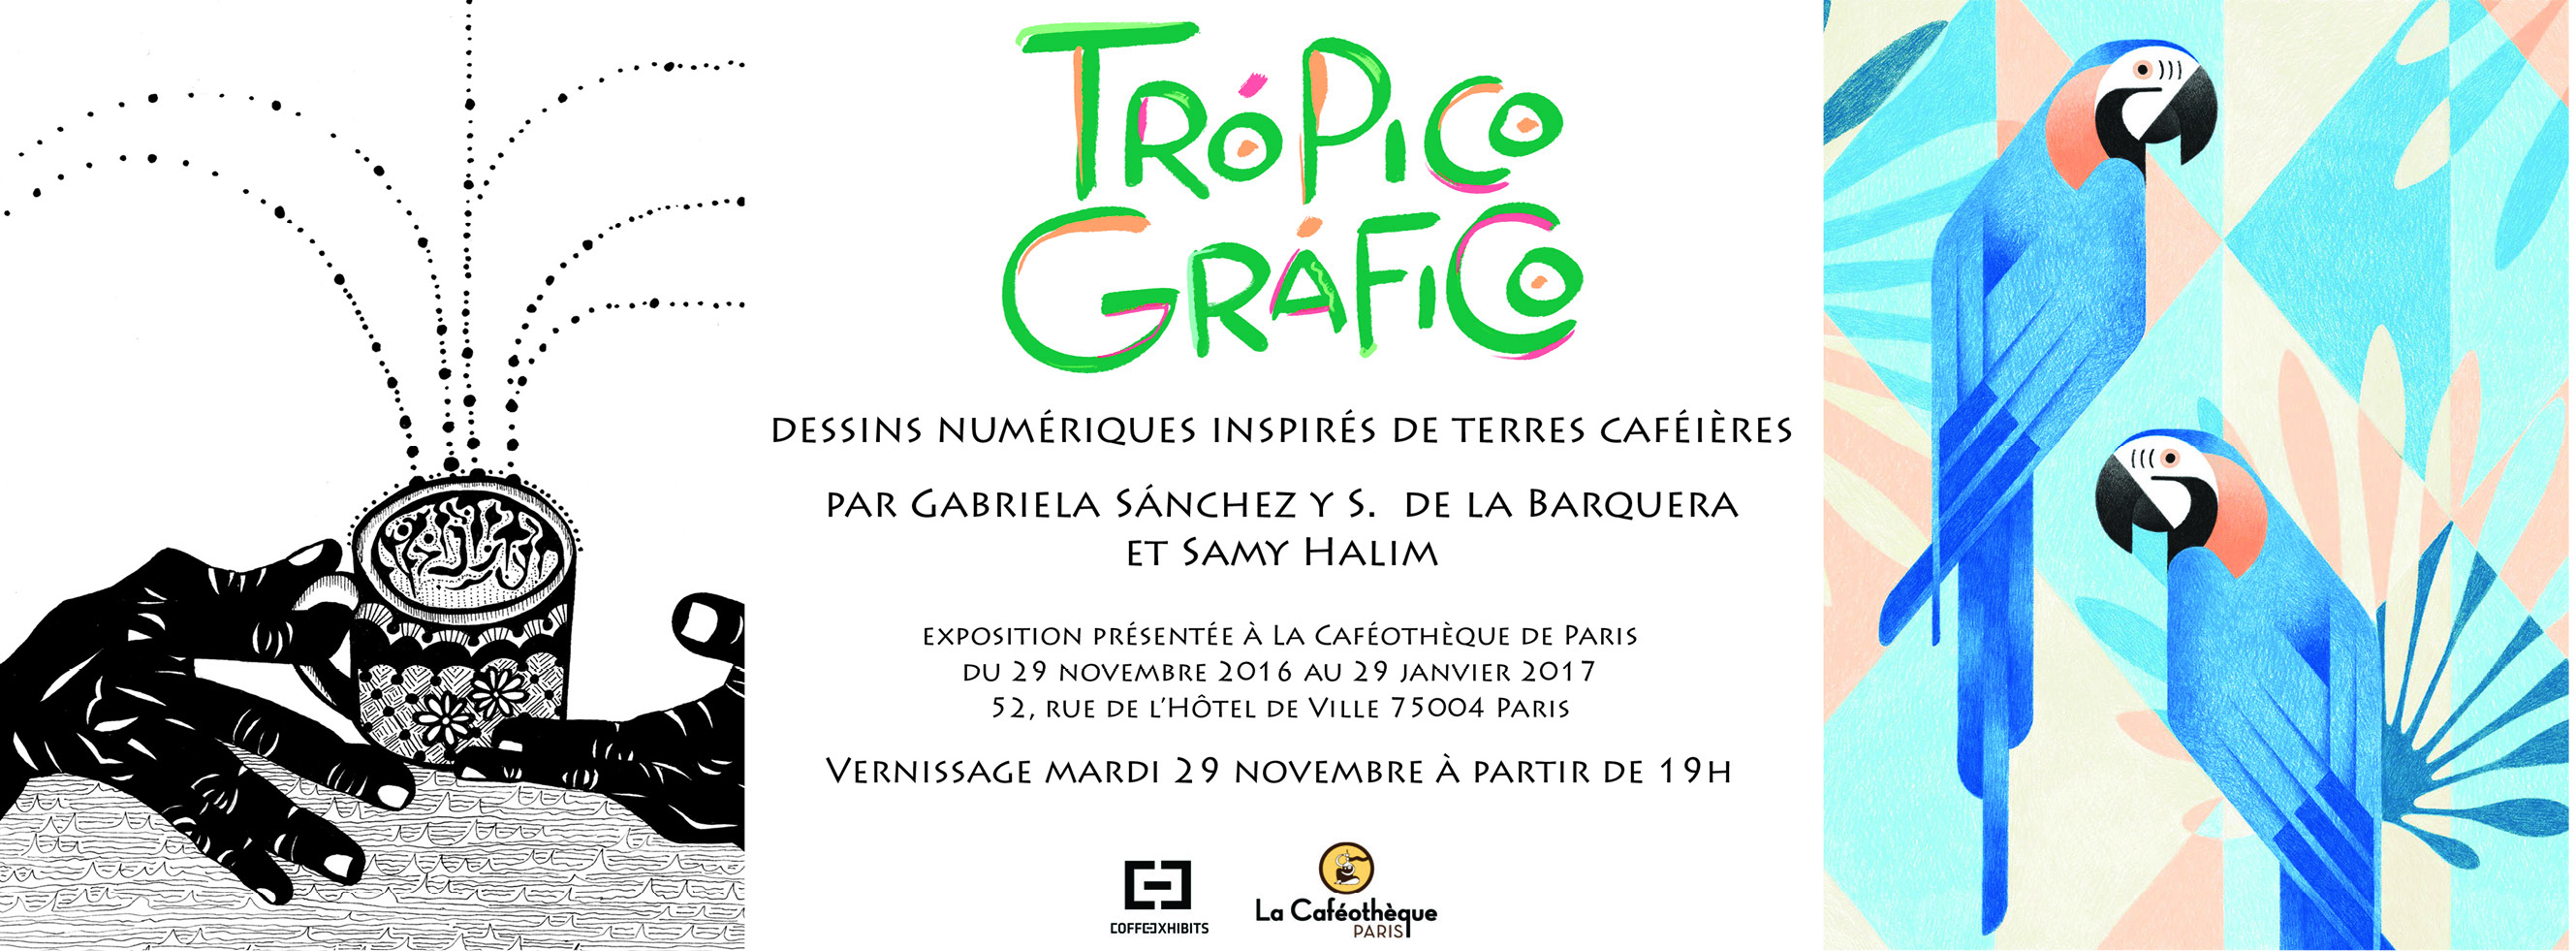 tropicografico-banner-3